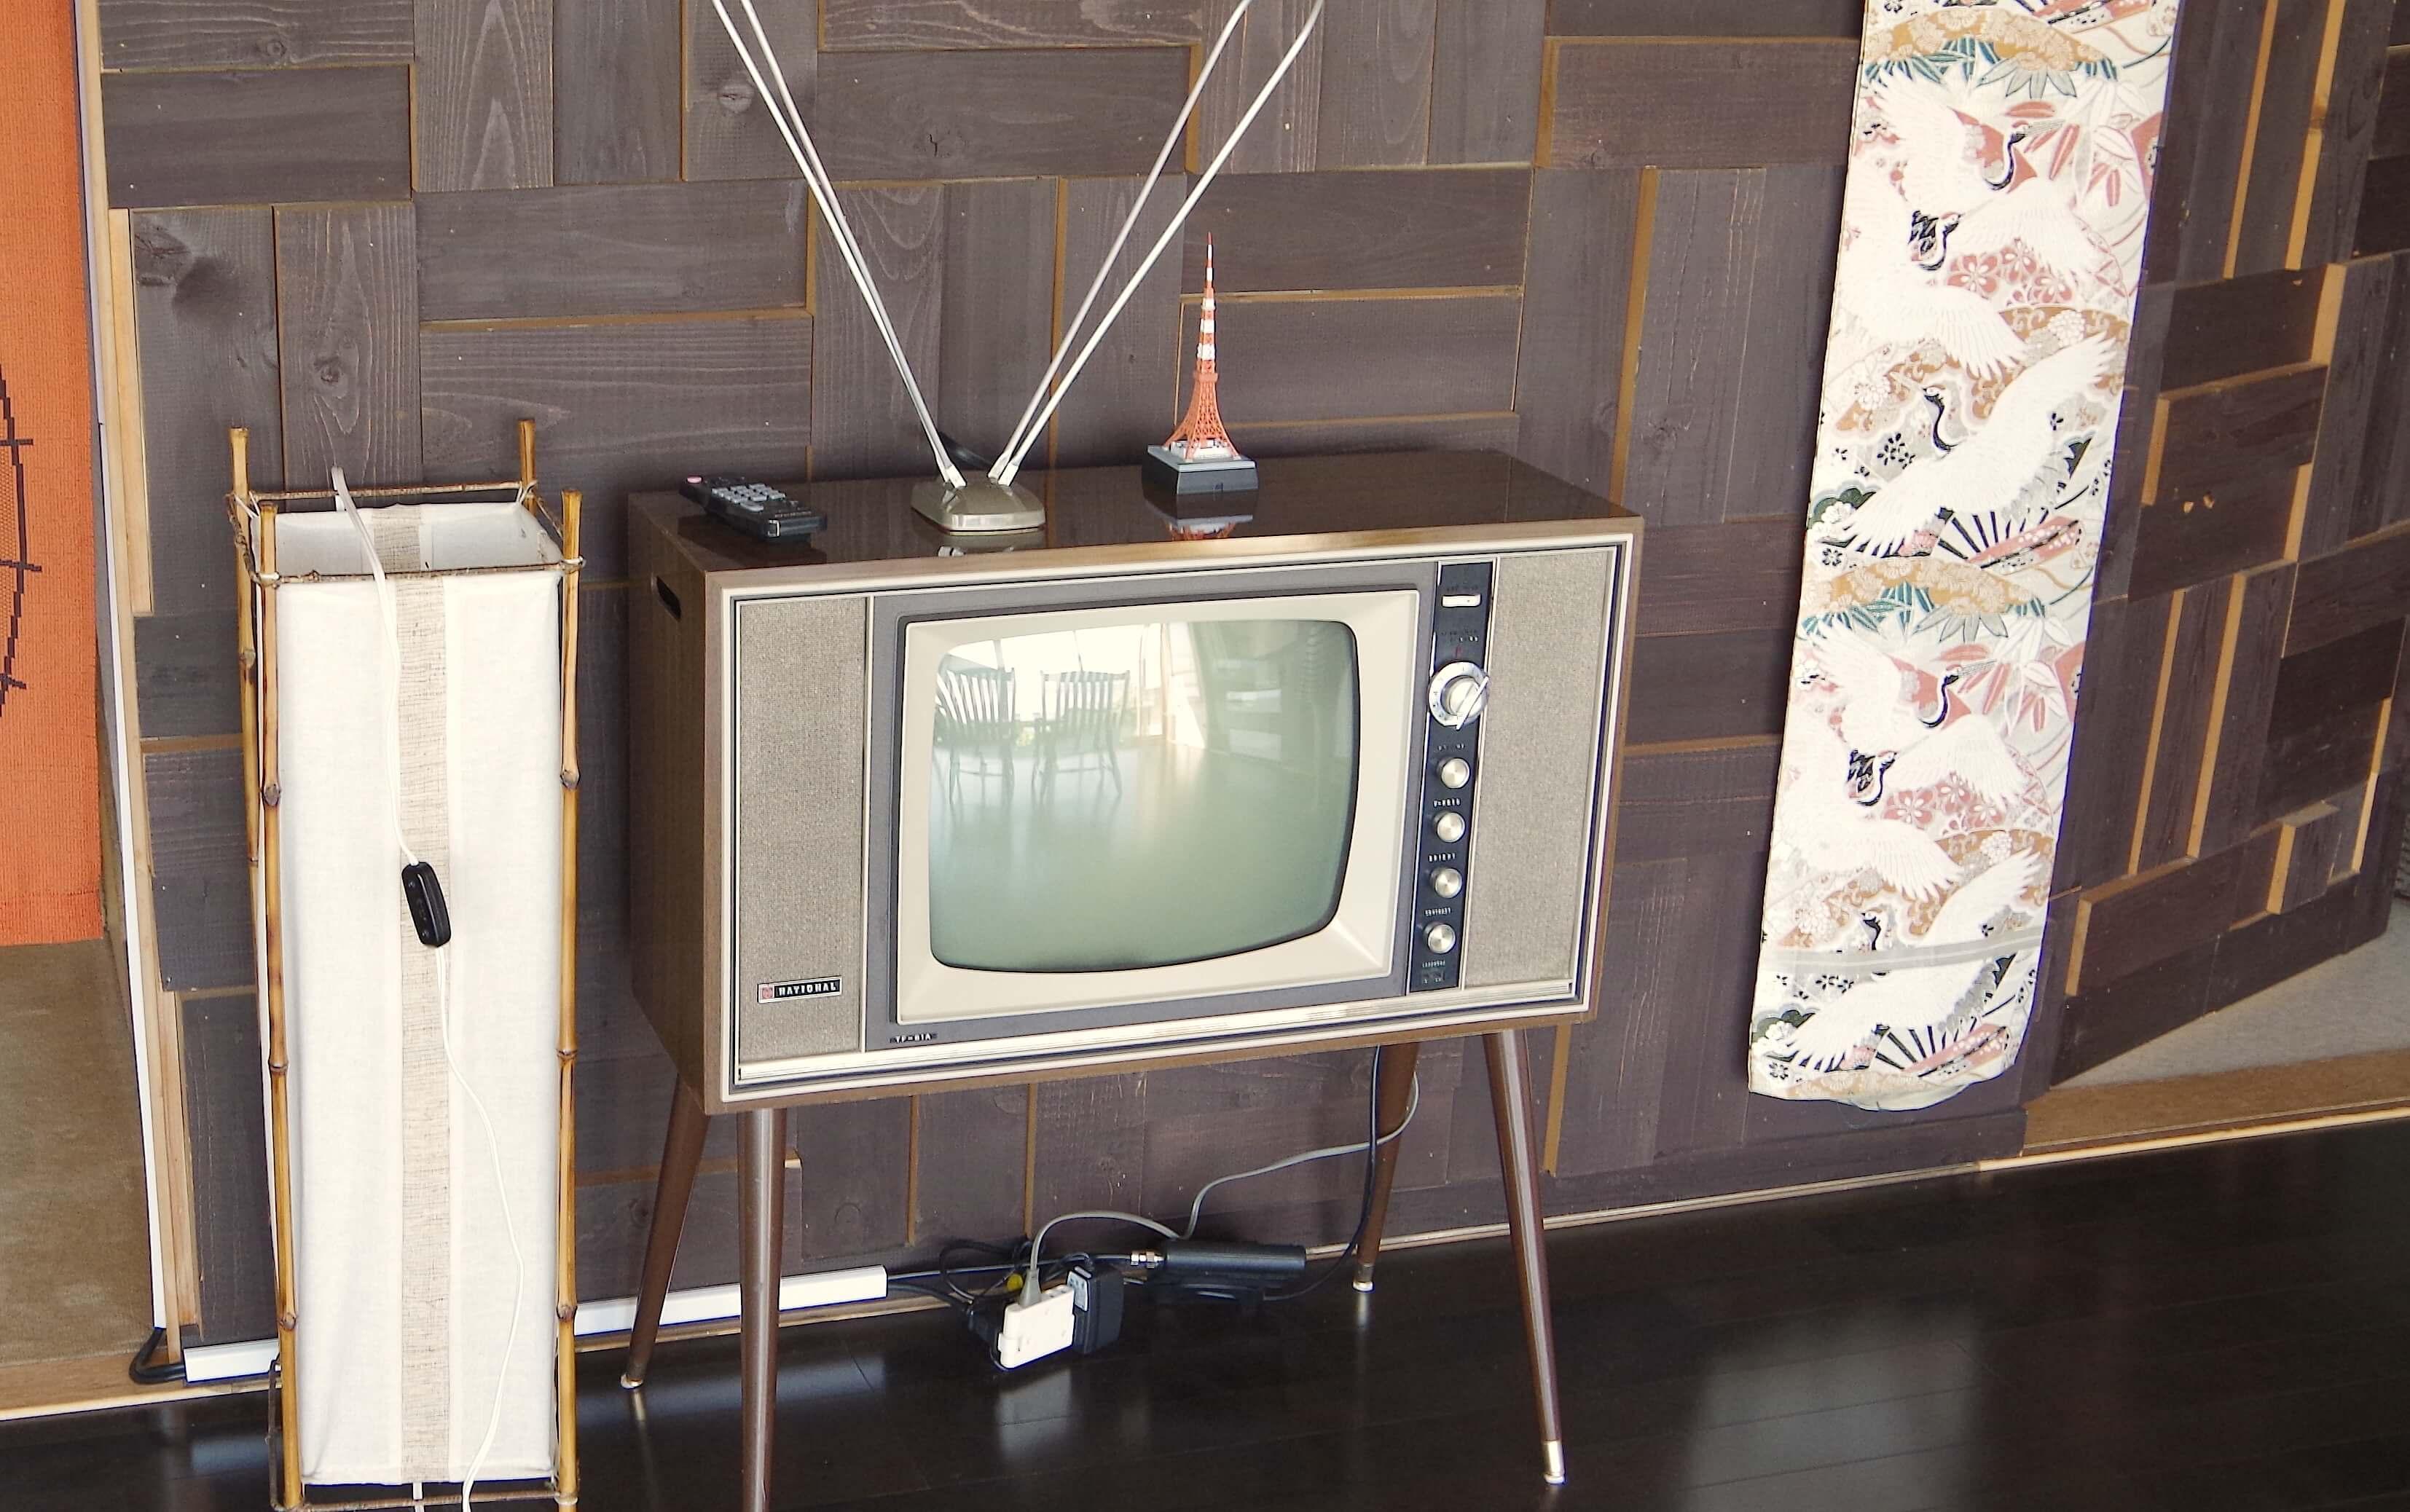 THE昭和なテレビも!これ、実はちゃんと映るんですよ。